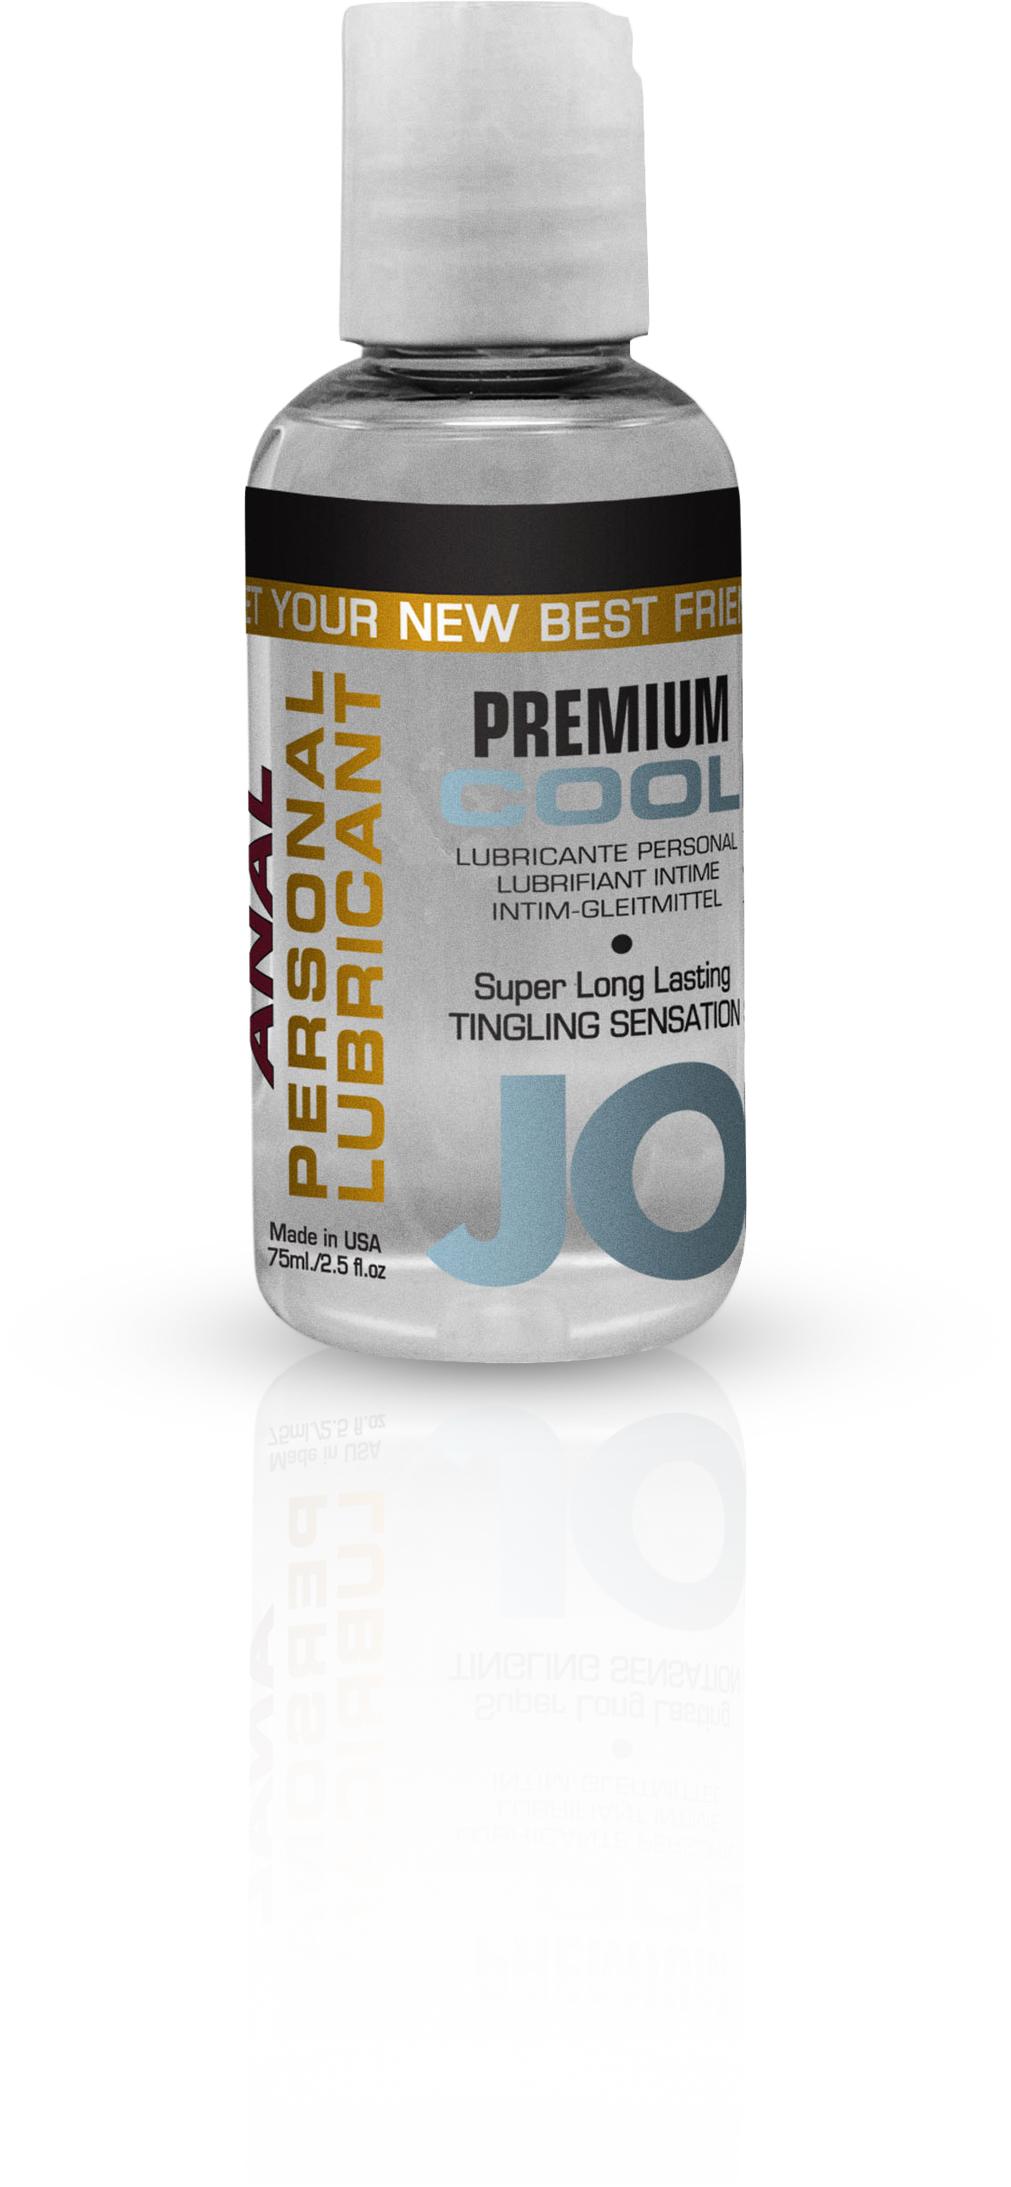 40108_JO_anal_premium_lube_cool_2.5oz.jpg